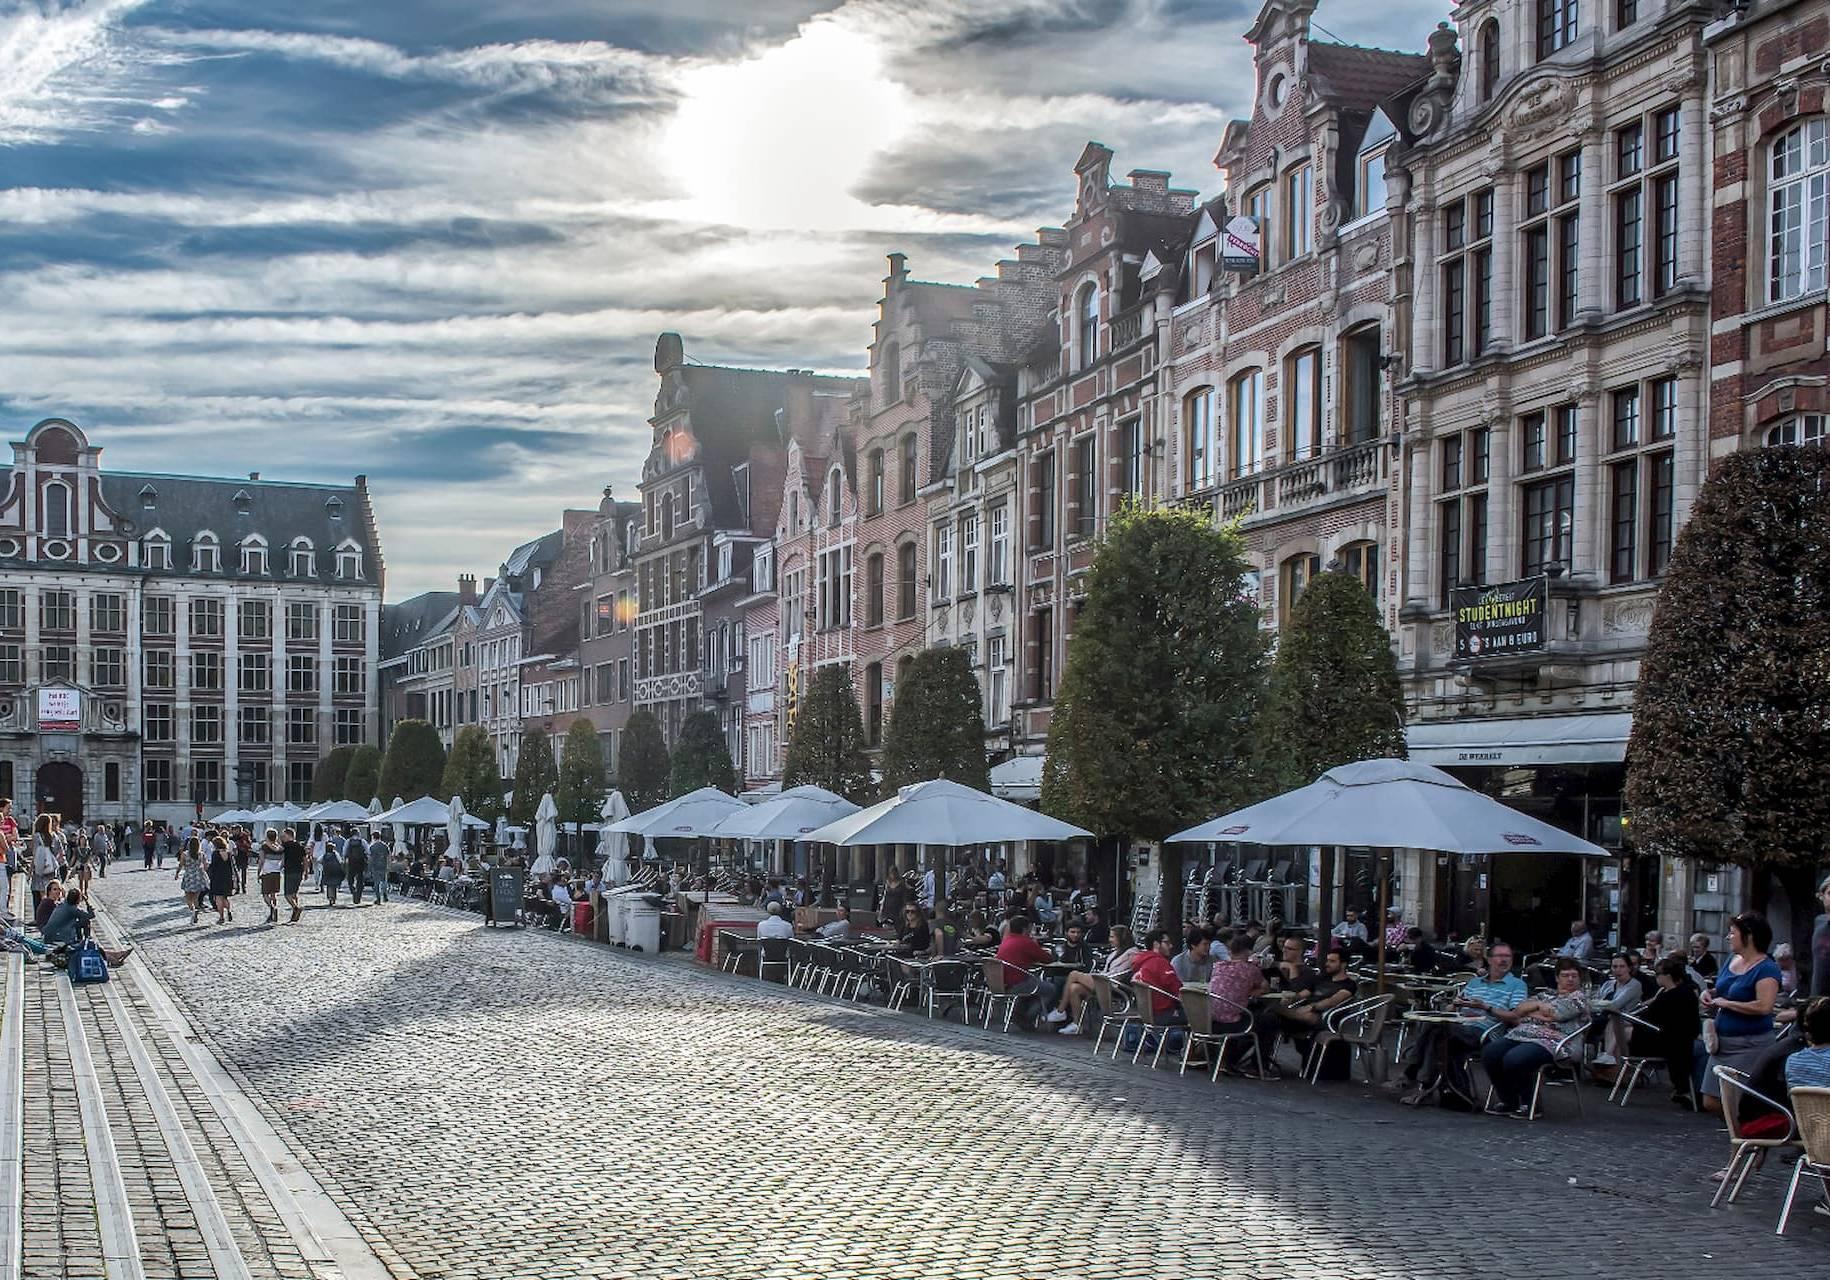 Lucid Leuven Street View Zoom